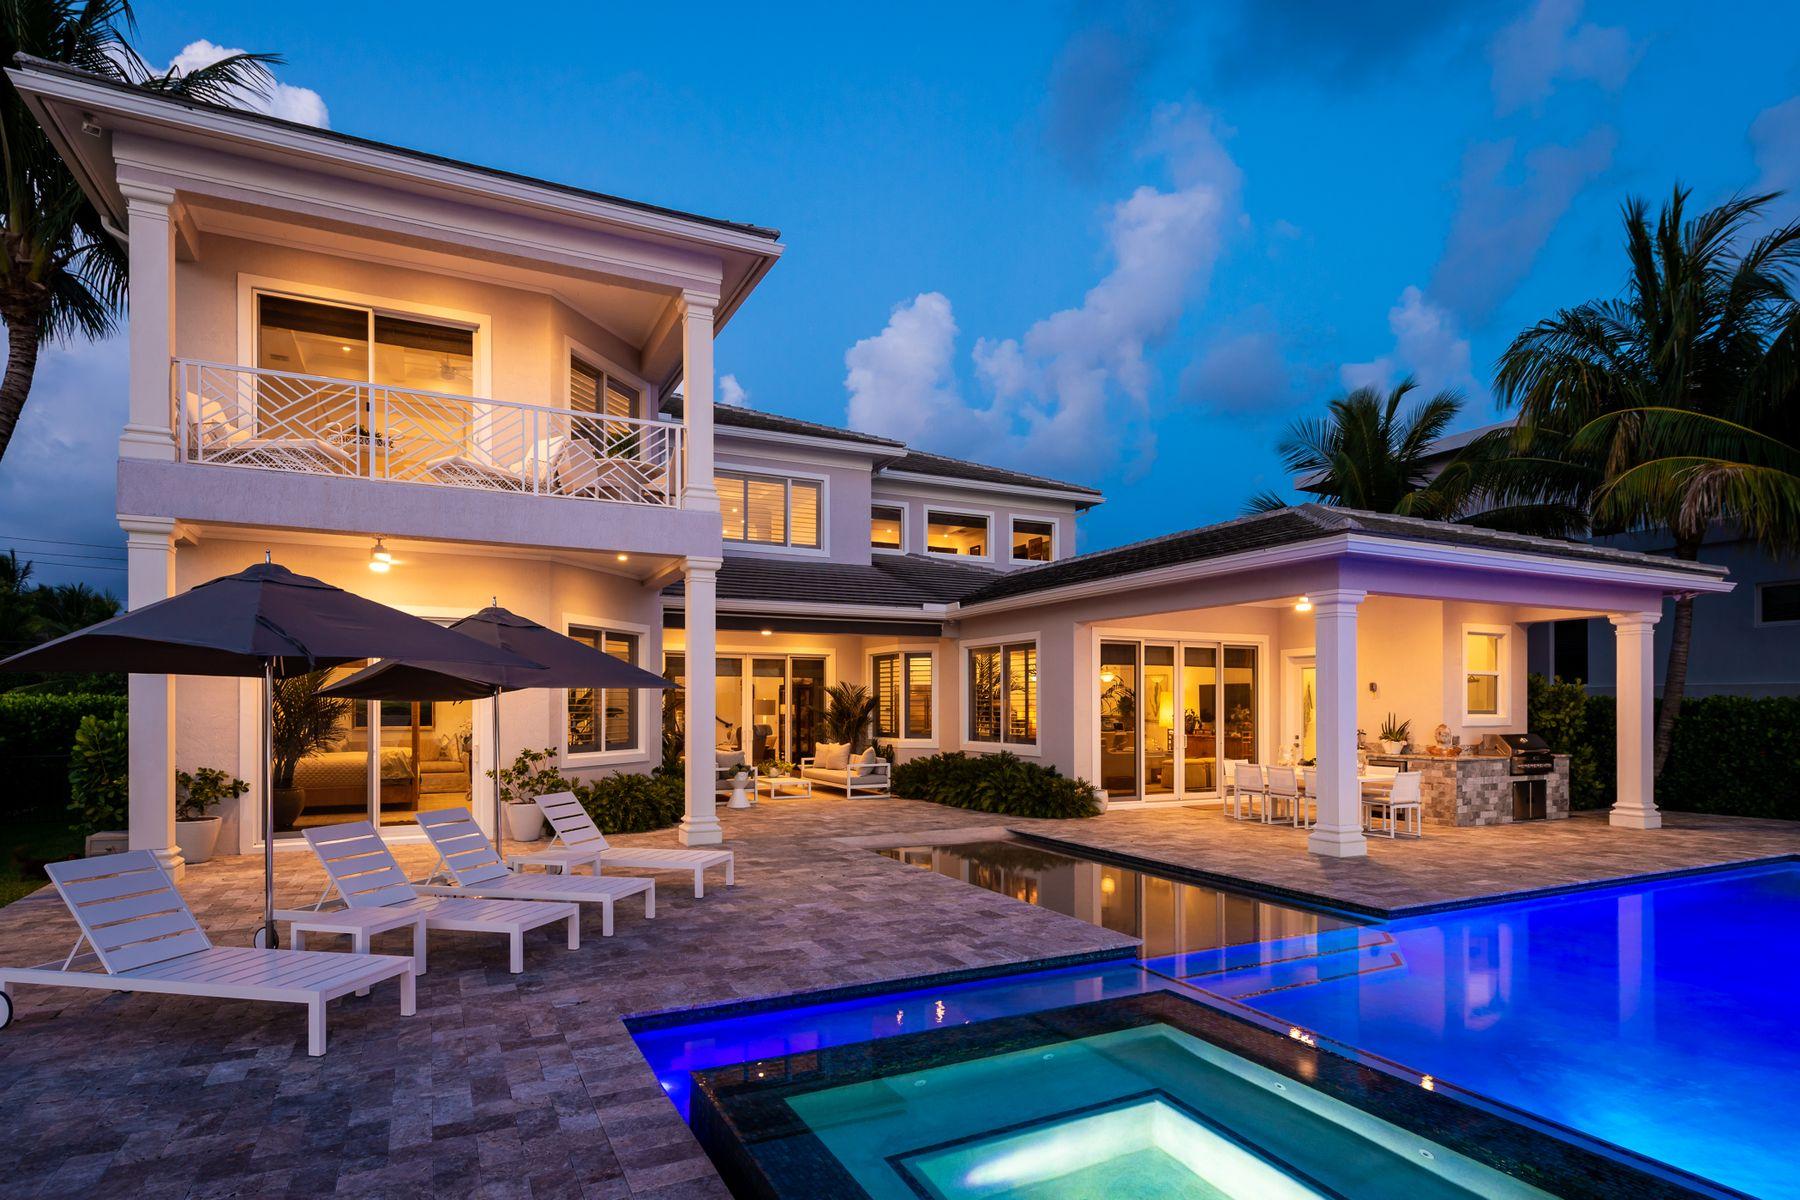 Single Family Homes for Sale at 317 S Atlantic Drive 317 S Atlantic Dr Lantana, Florida 33462 United States